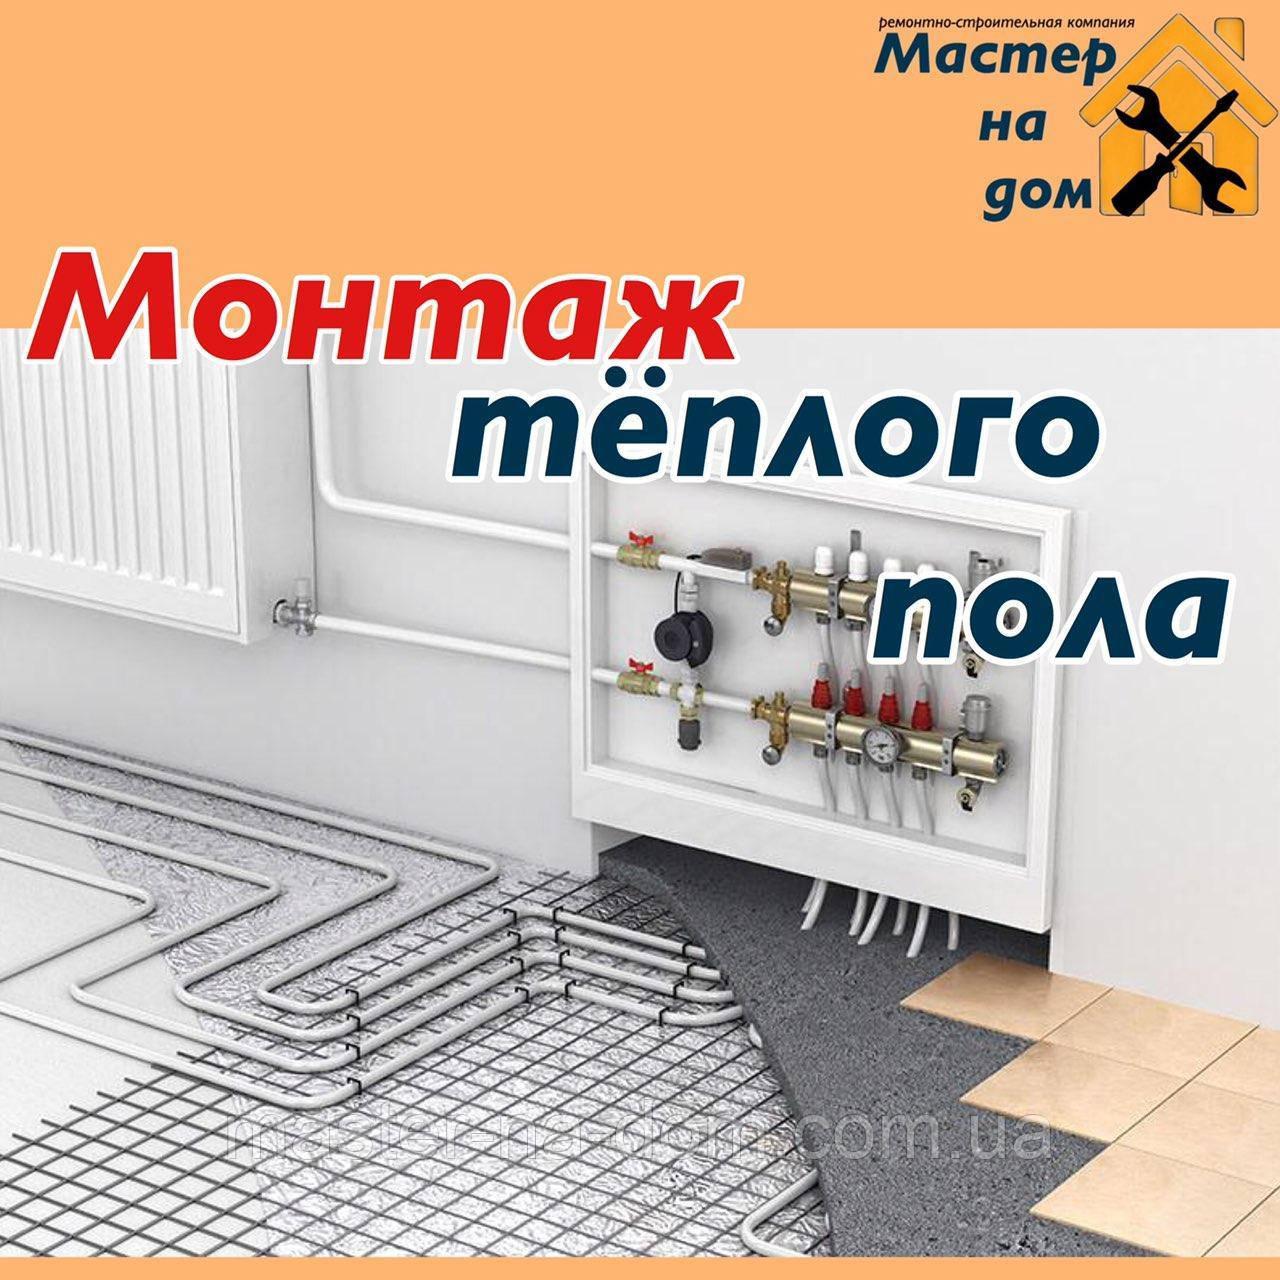 Монтаж теплого пола в Одессе